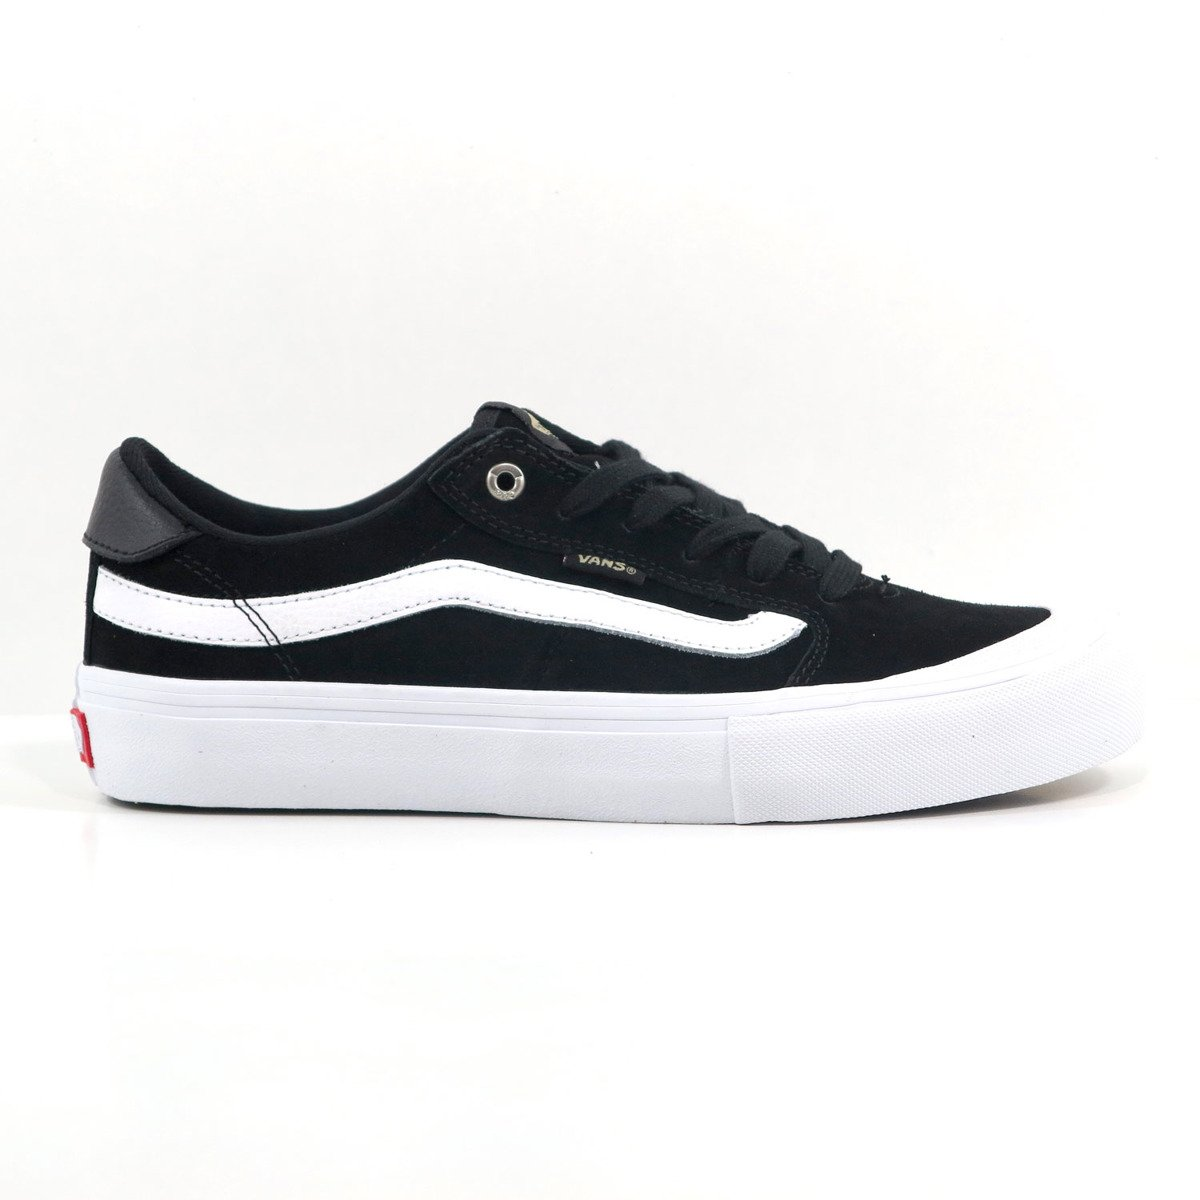 ce8aa9293f51d Miniramp Skateshop buty vans style 112 pro black/black/white